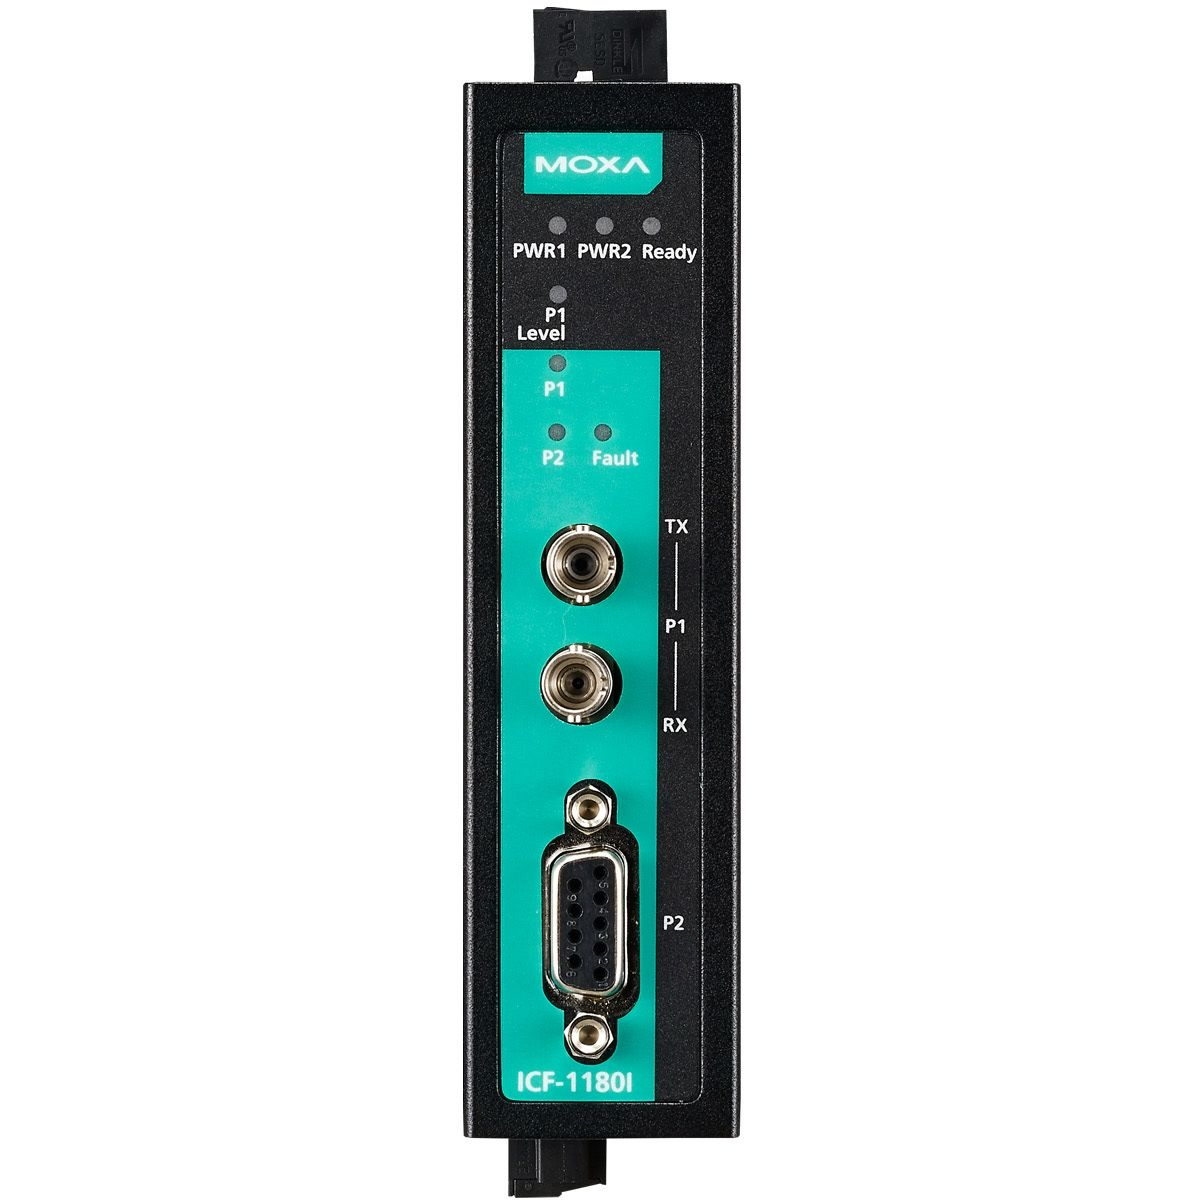 ICF-1180I-M-ST